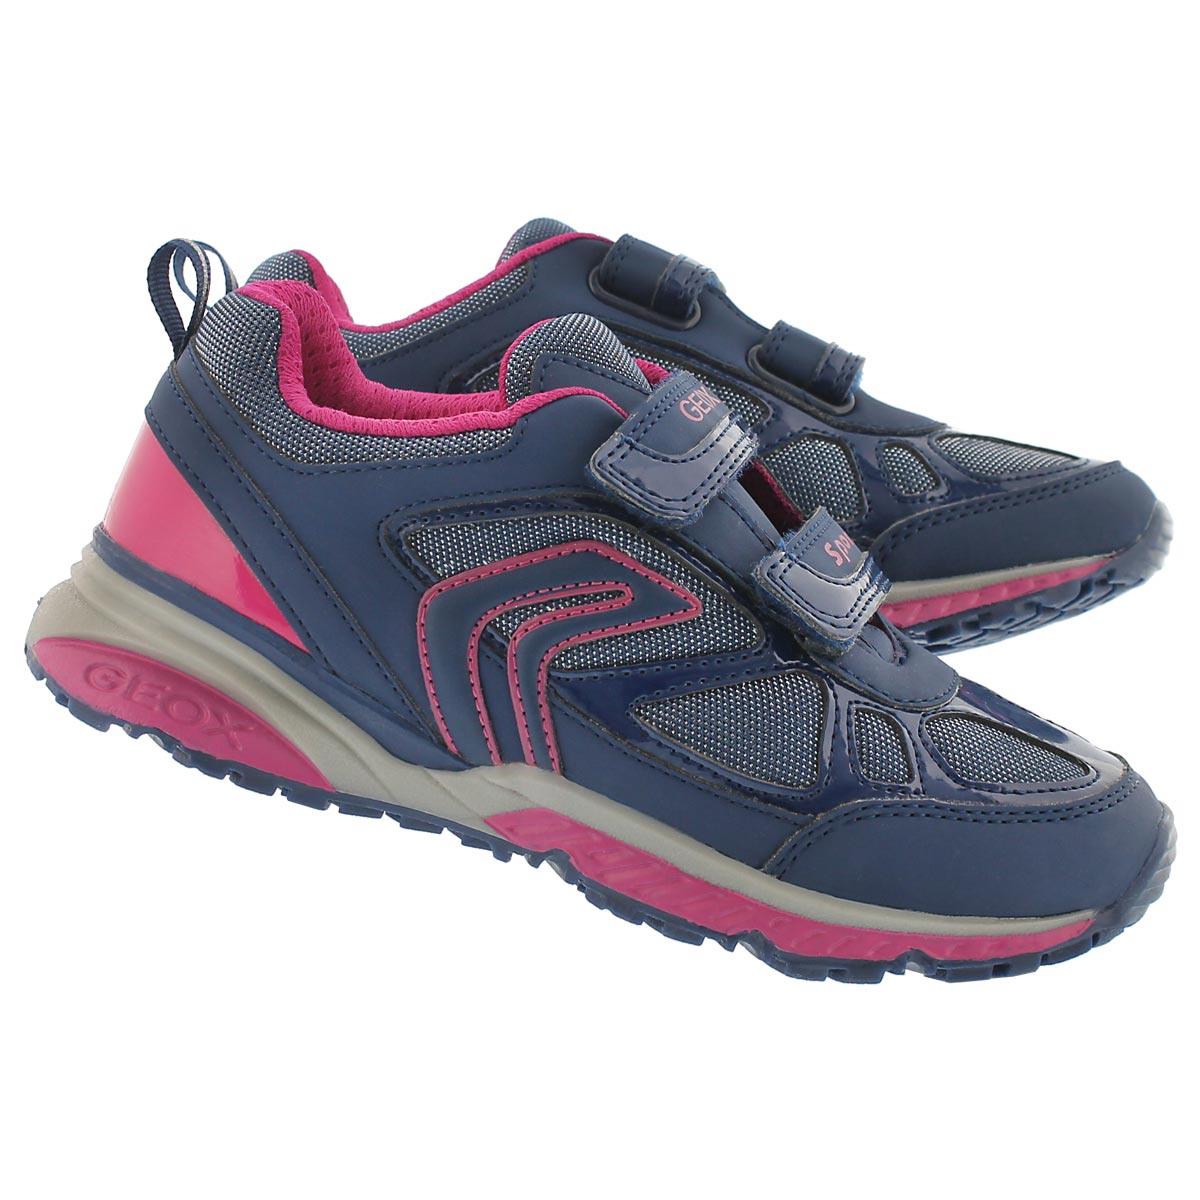 Grls Bernie navy/fuchsia sneaker